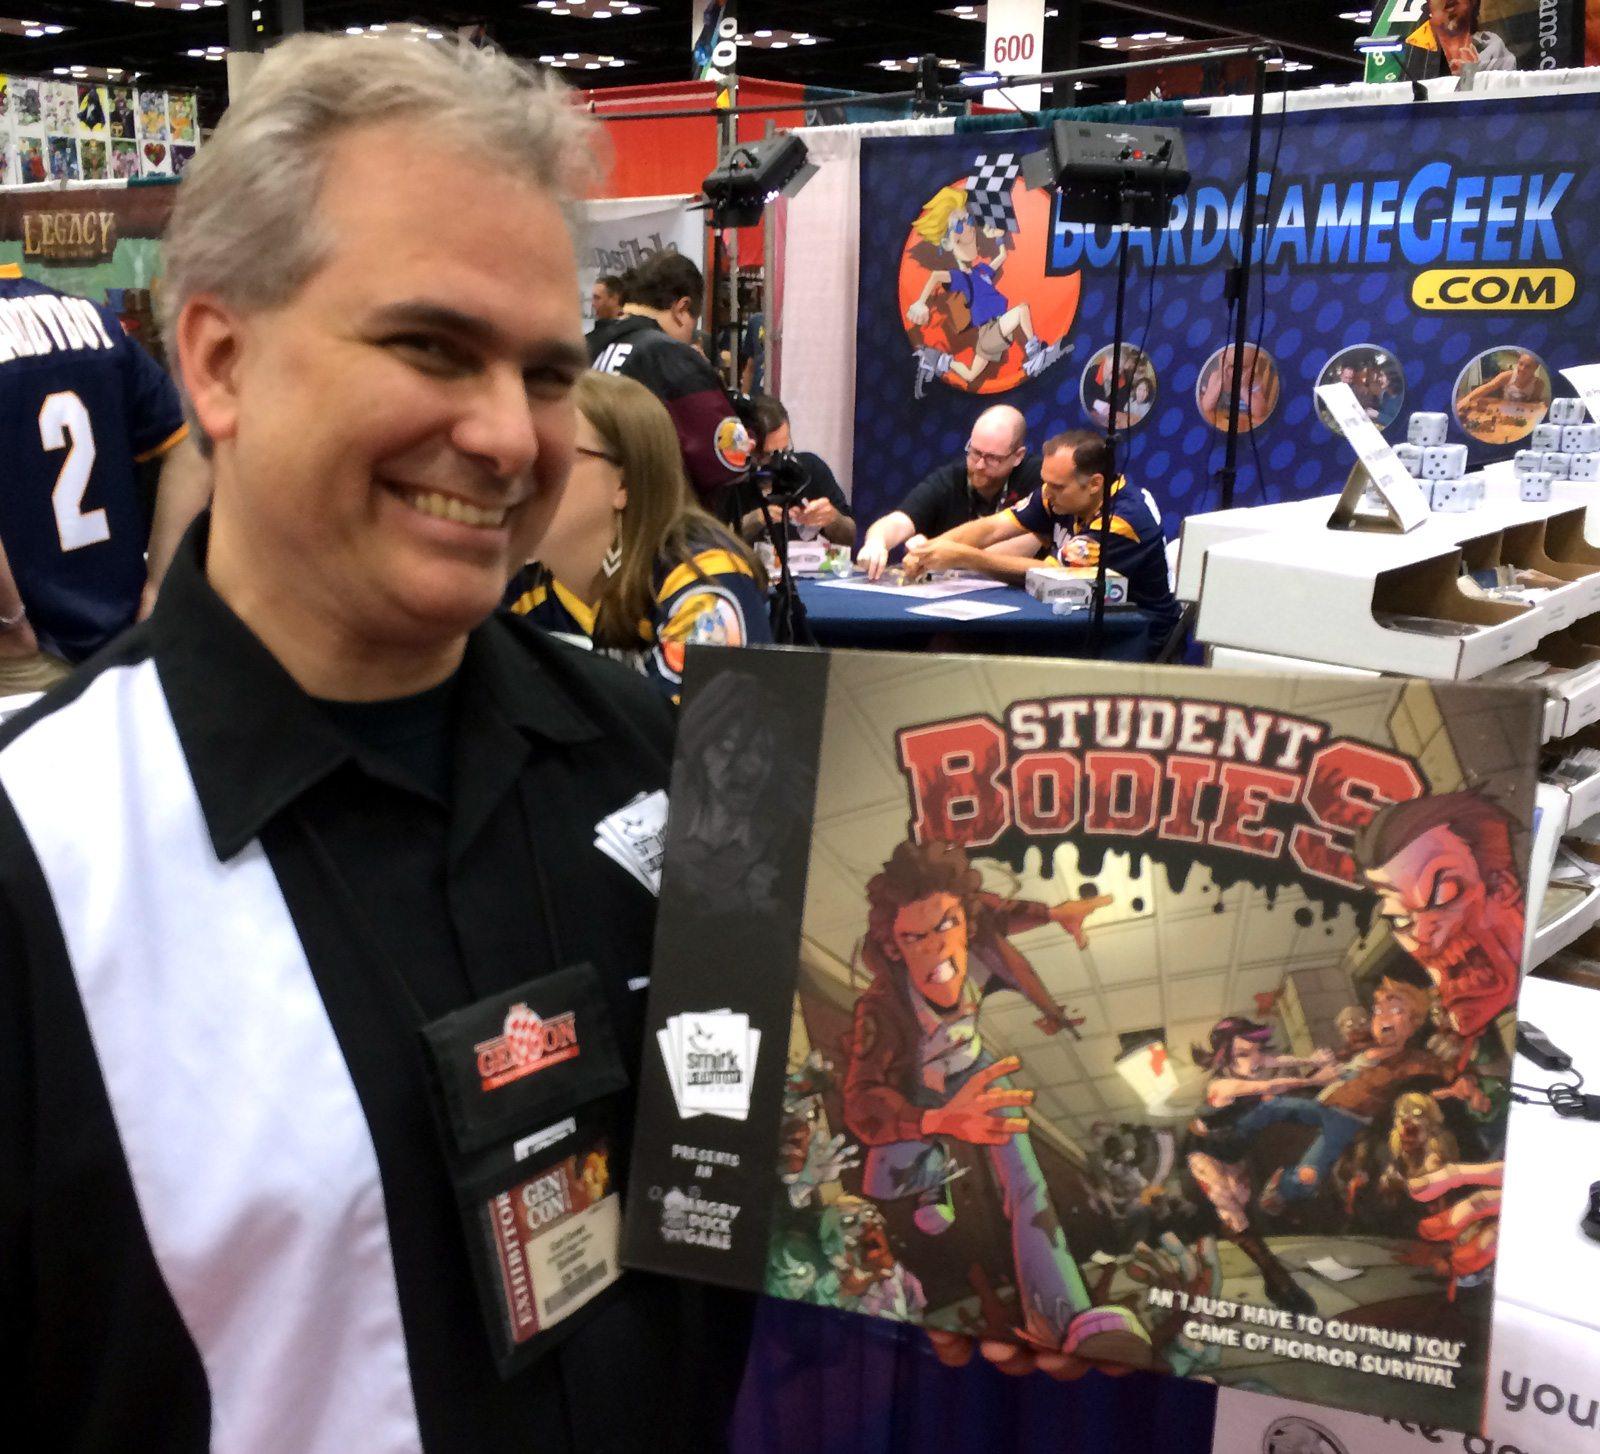 Student Bodies - Curt Covert